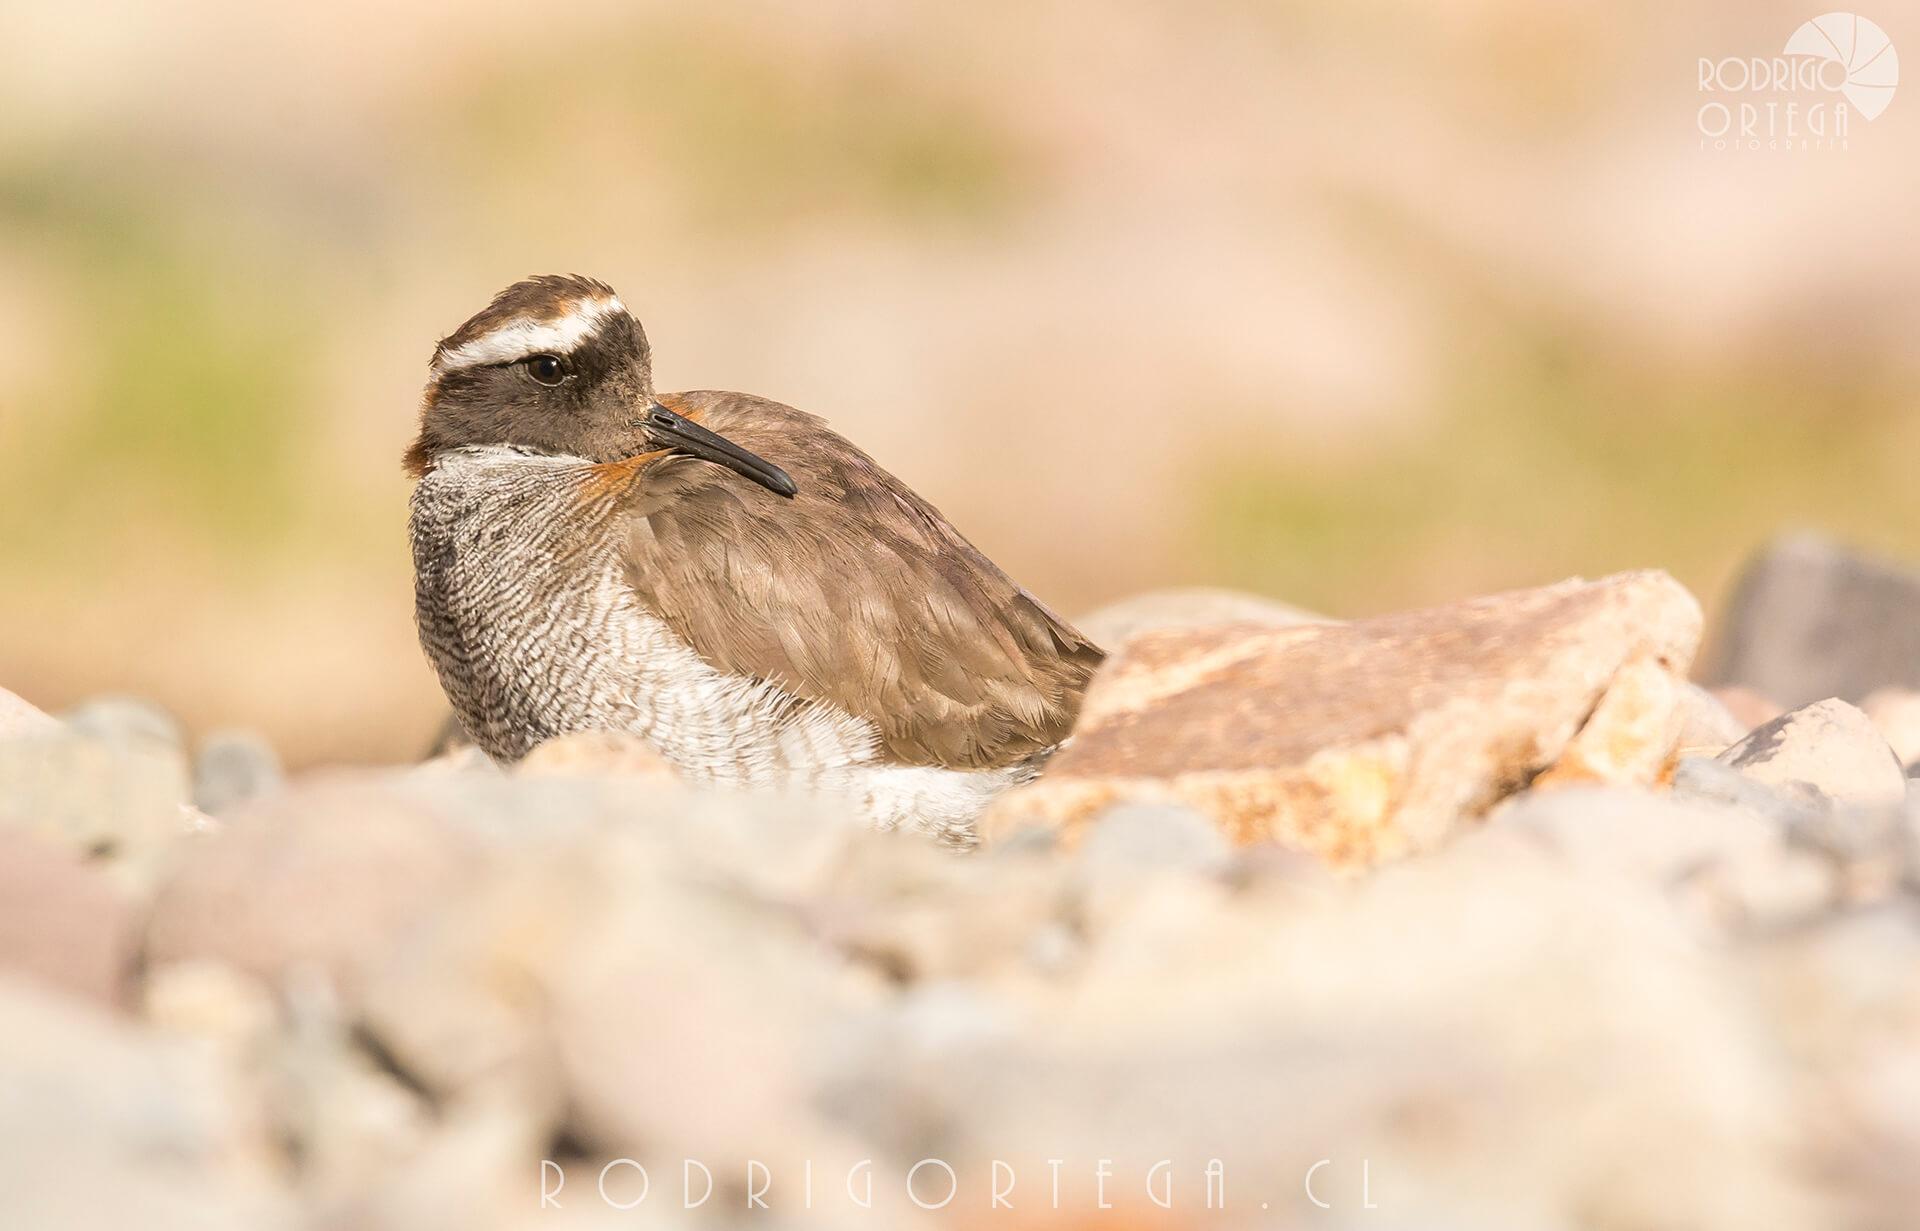 Chorlito cordillerano (Phegornis mitchellii)